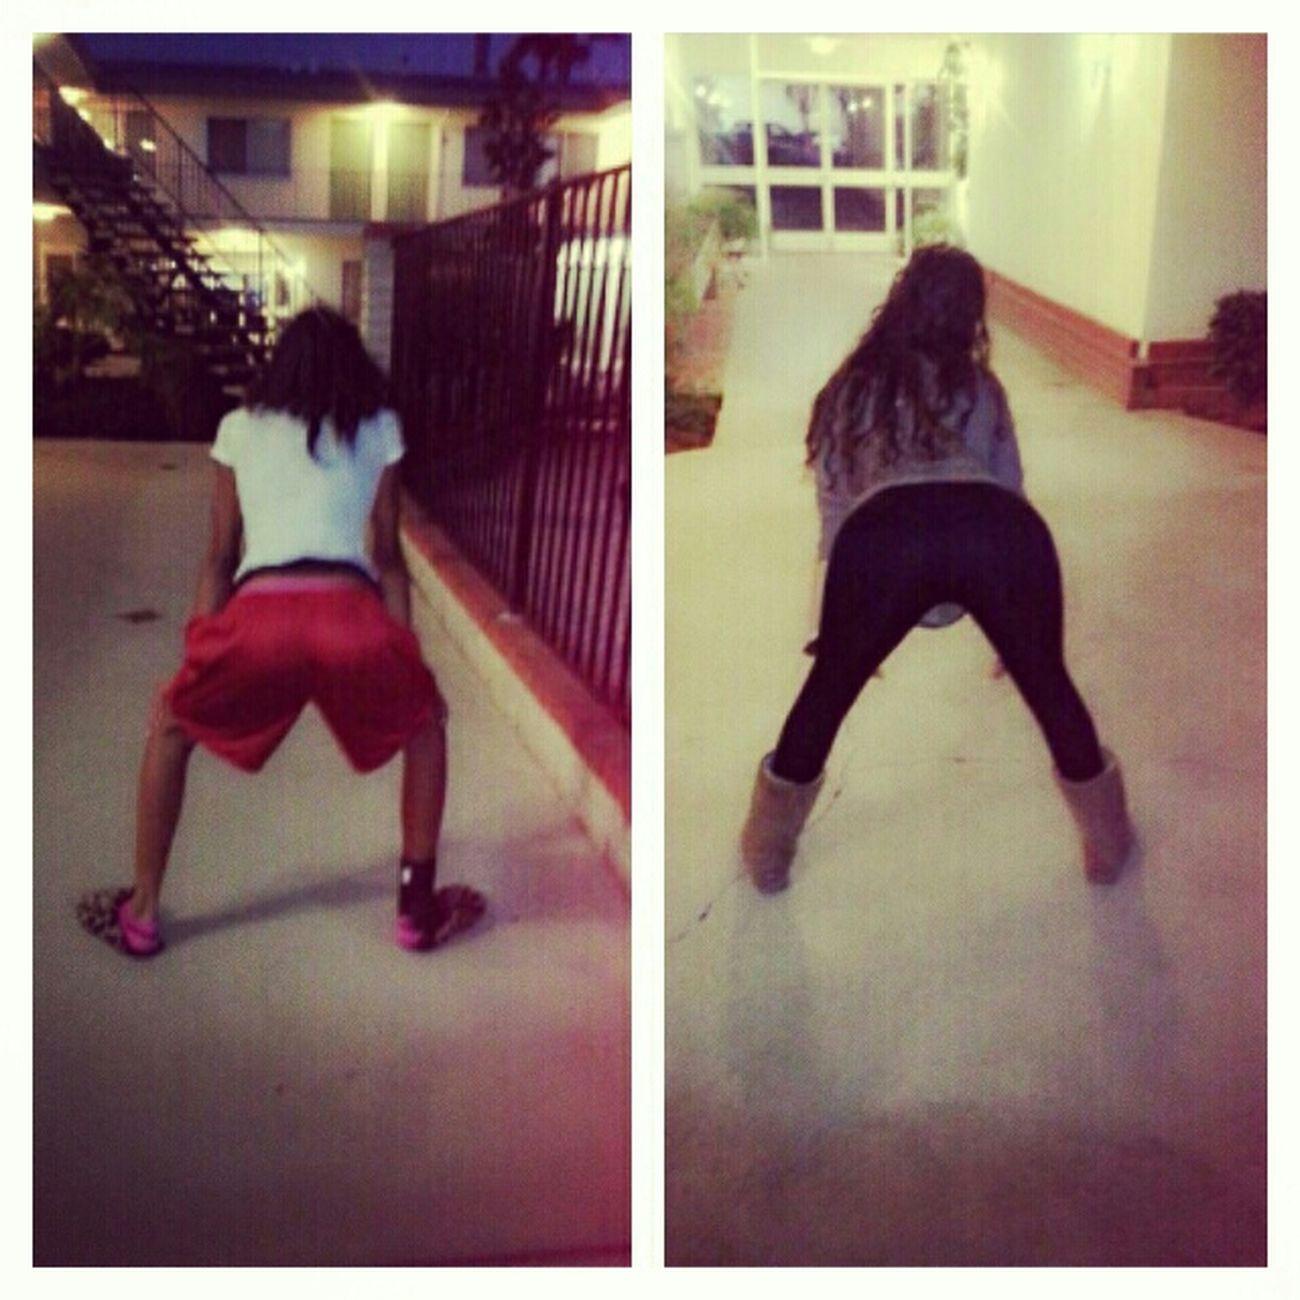 Twerking with my bestfriend haha, how we spend our fridays :P Popular #TwerkTeam Twerk (; Bestfriends✌